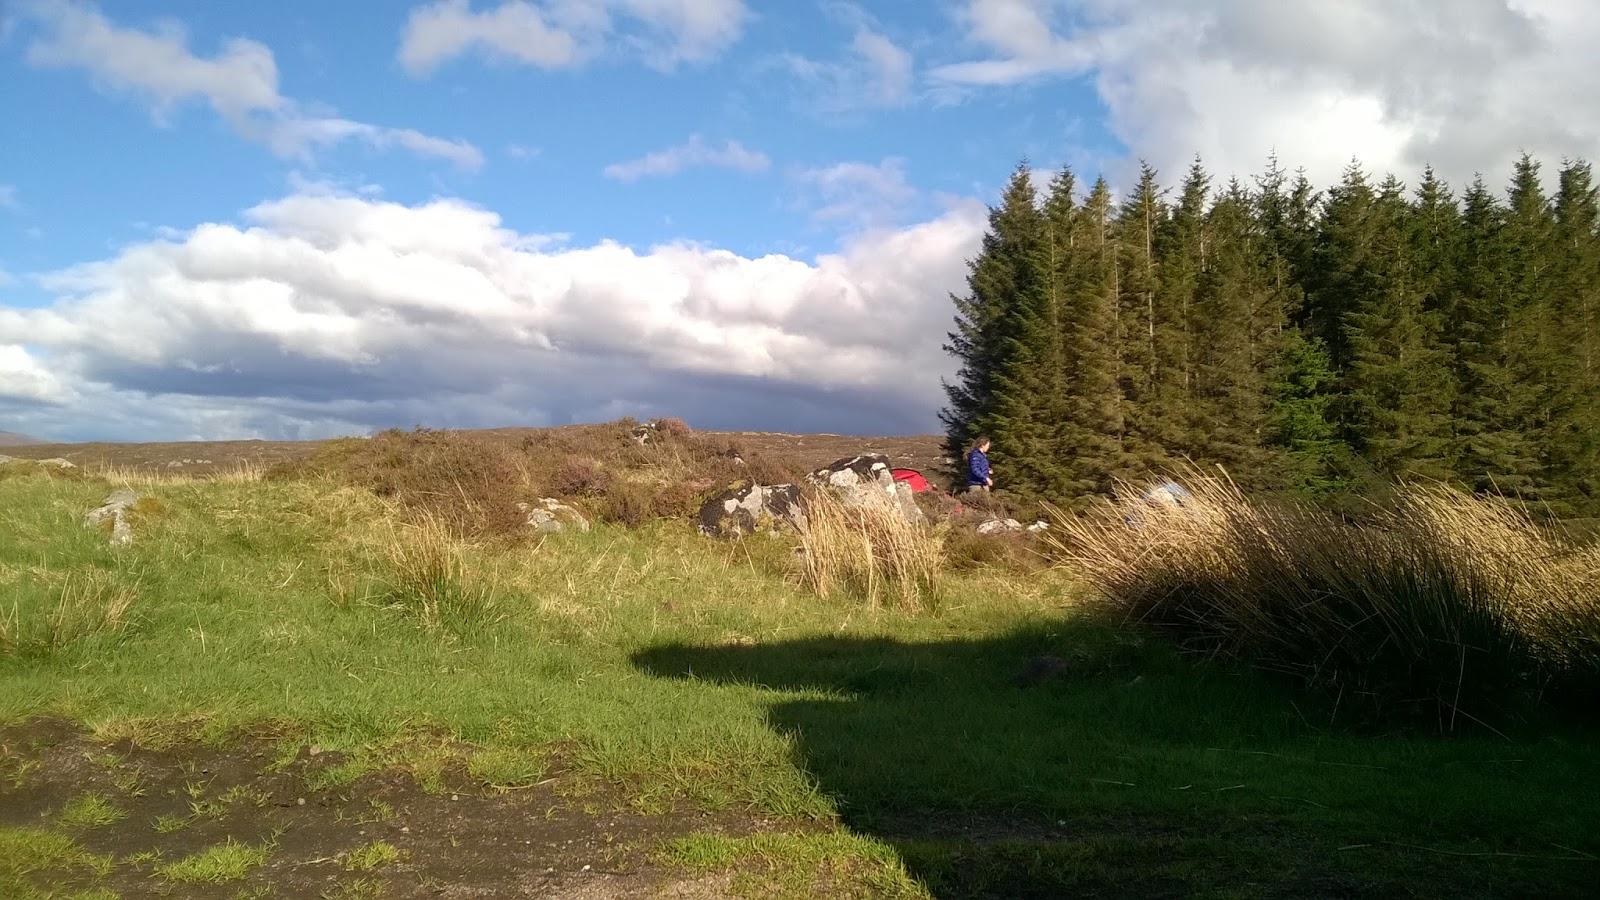 The Adventurists: Wild Camping Spots: The Kings House, Glencoe